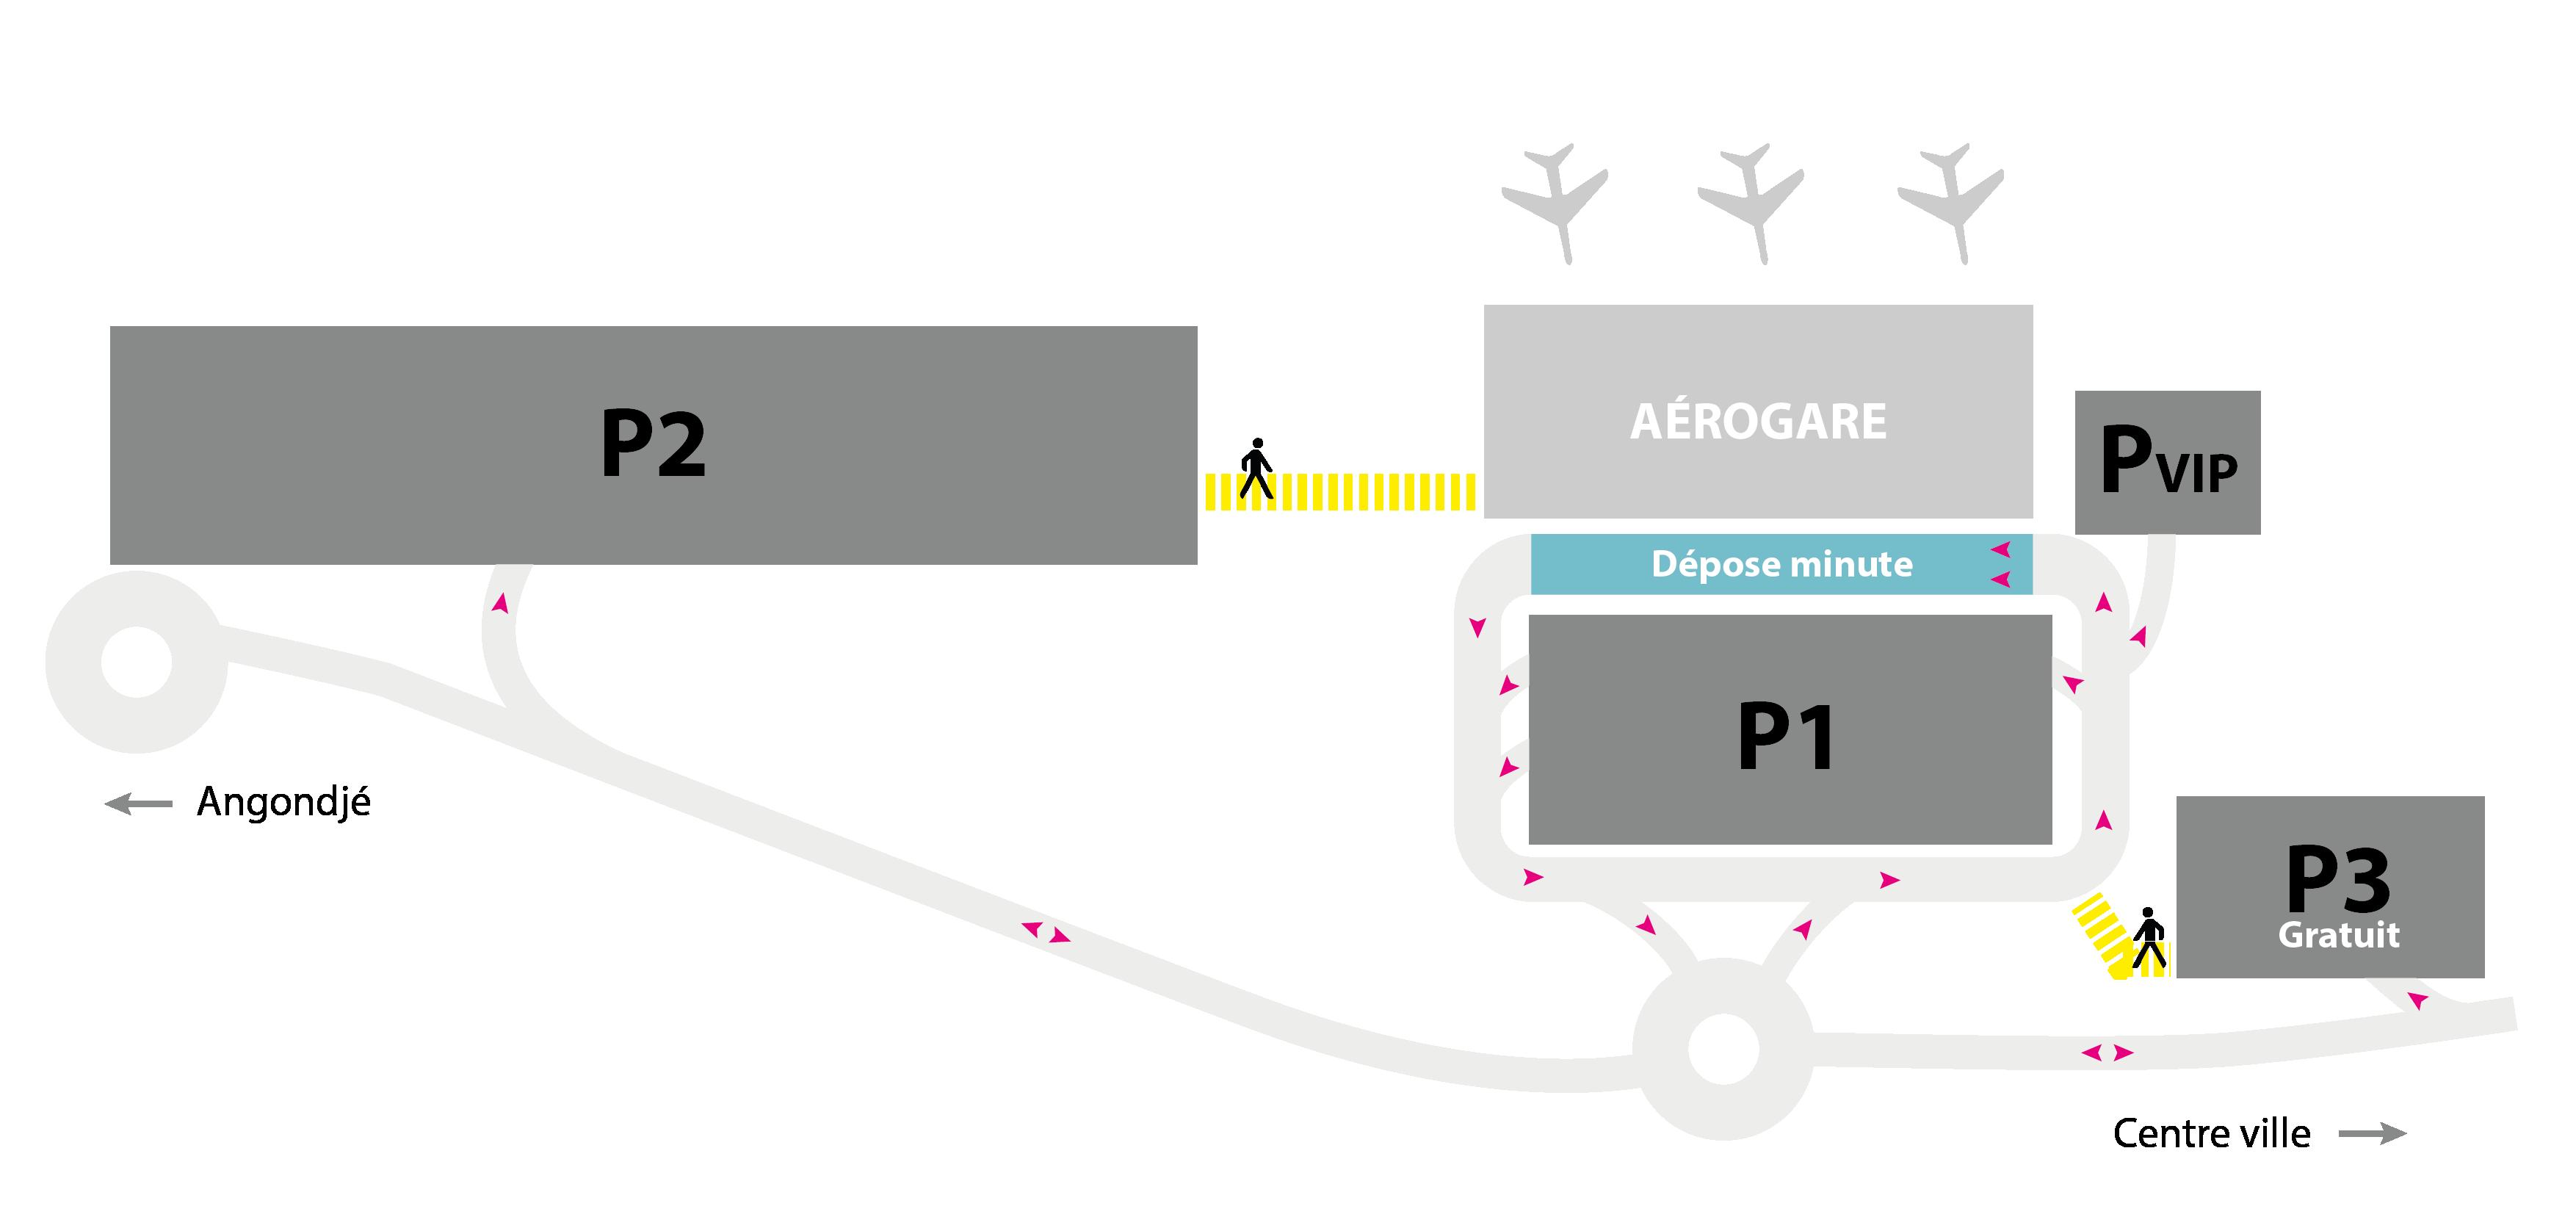 Airport_parking_plan_fr